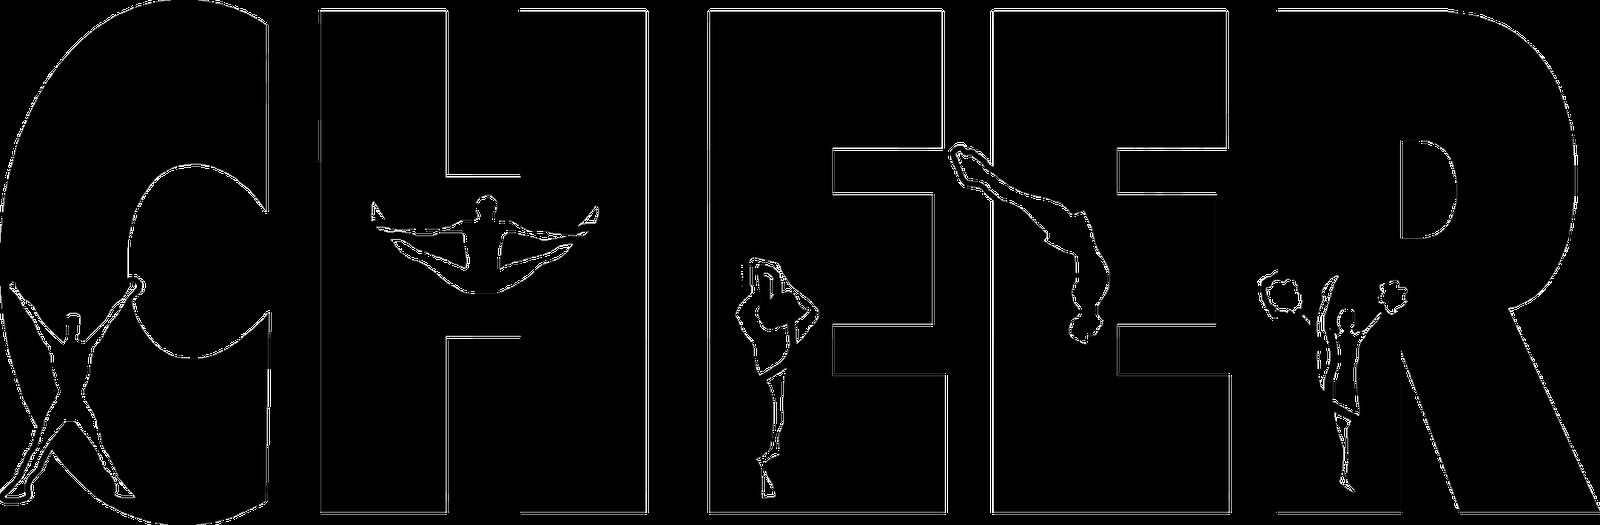 Cheerleading - Cliparts.co